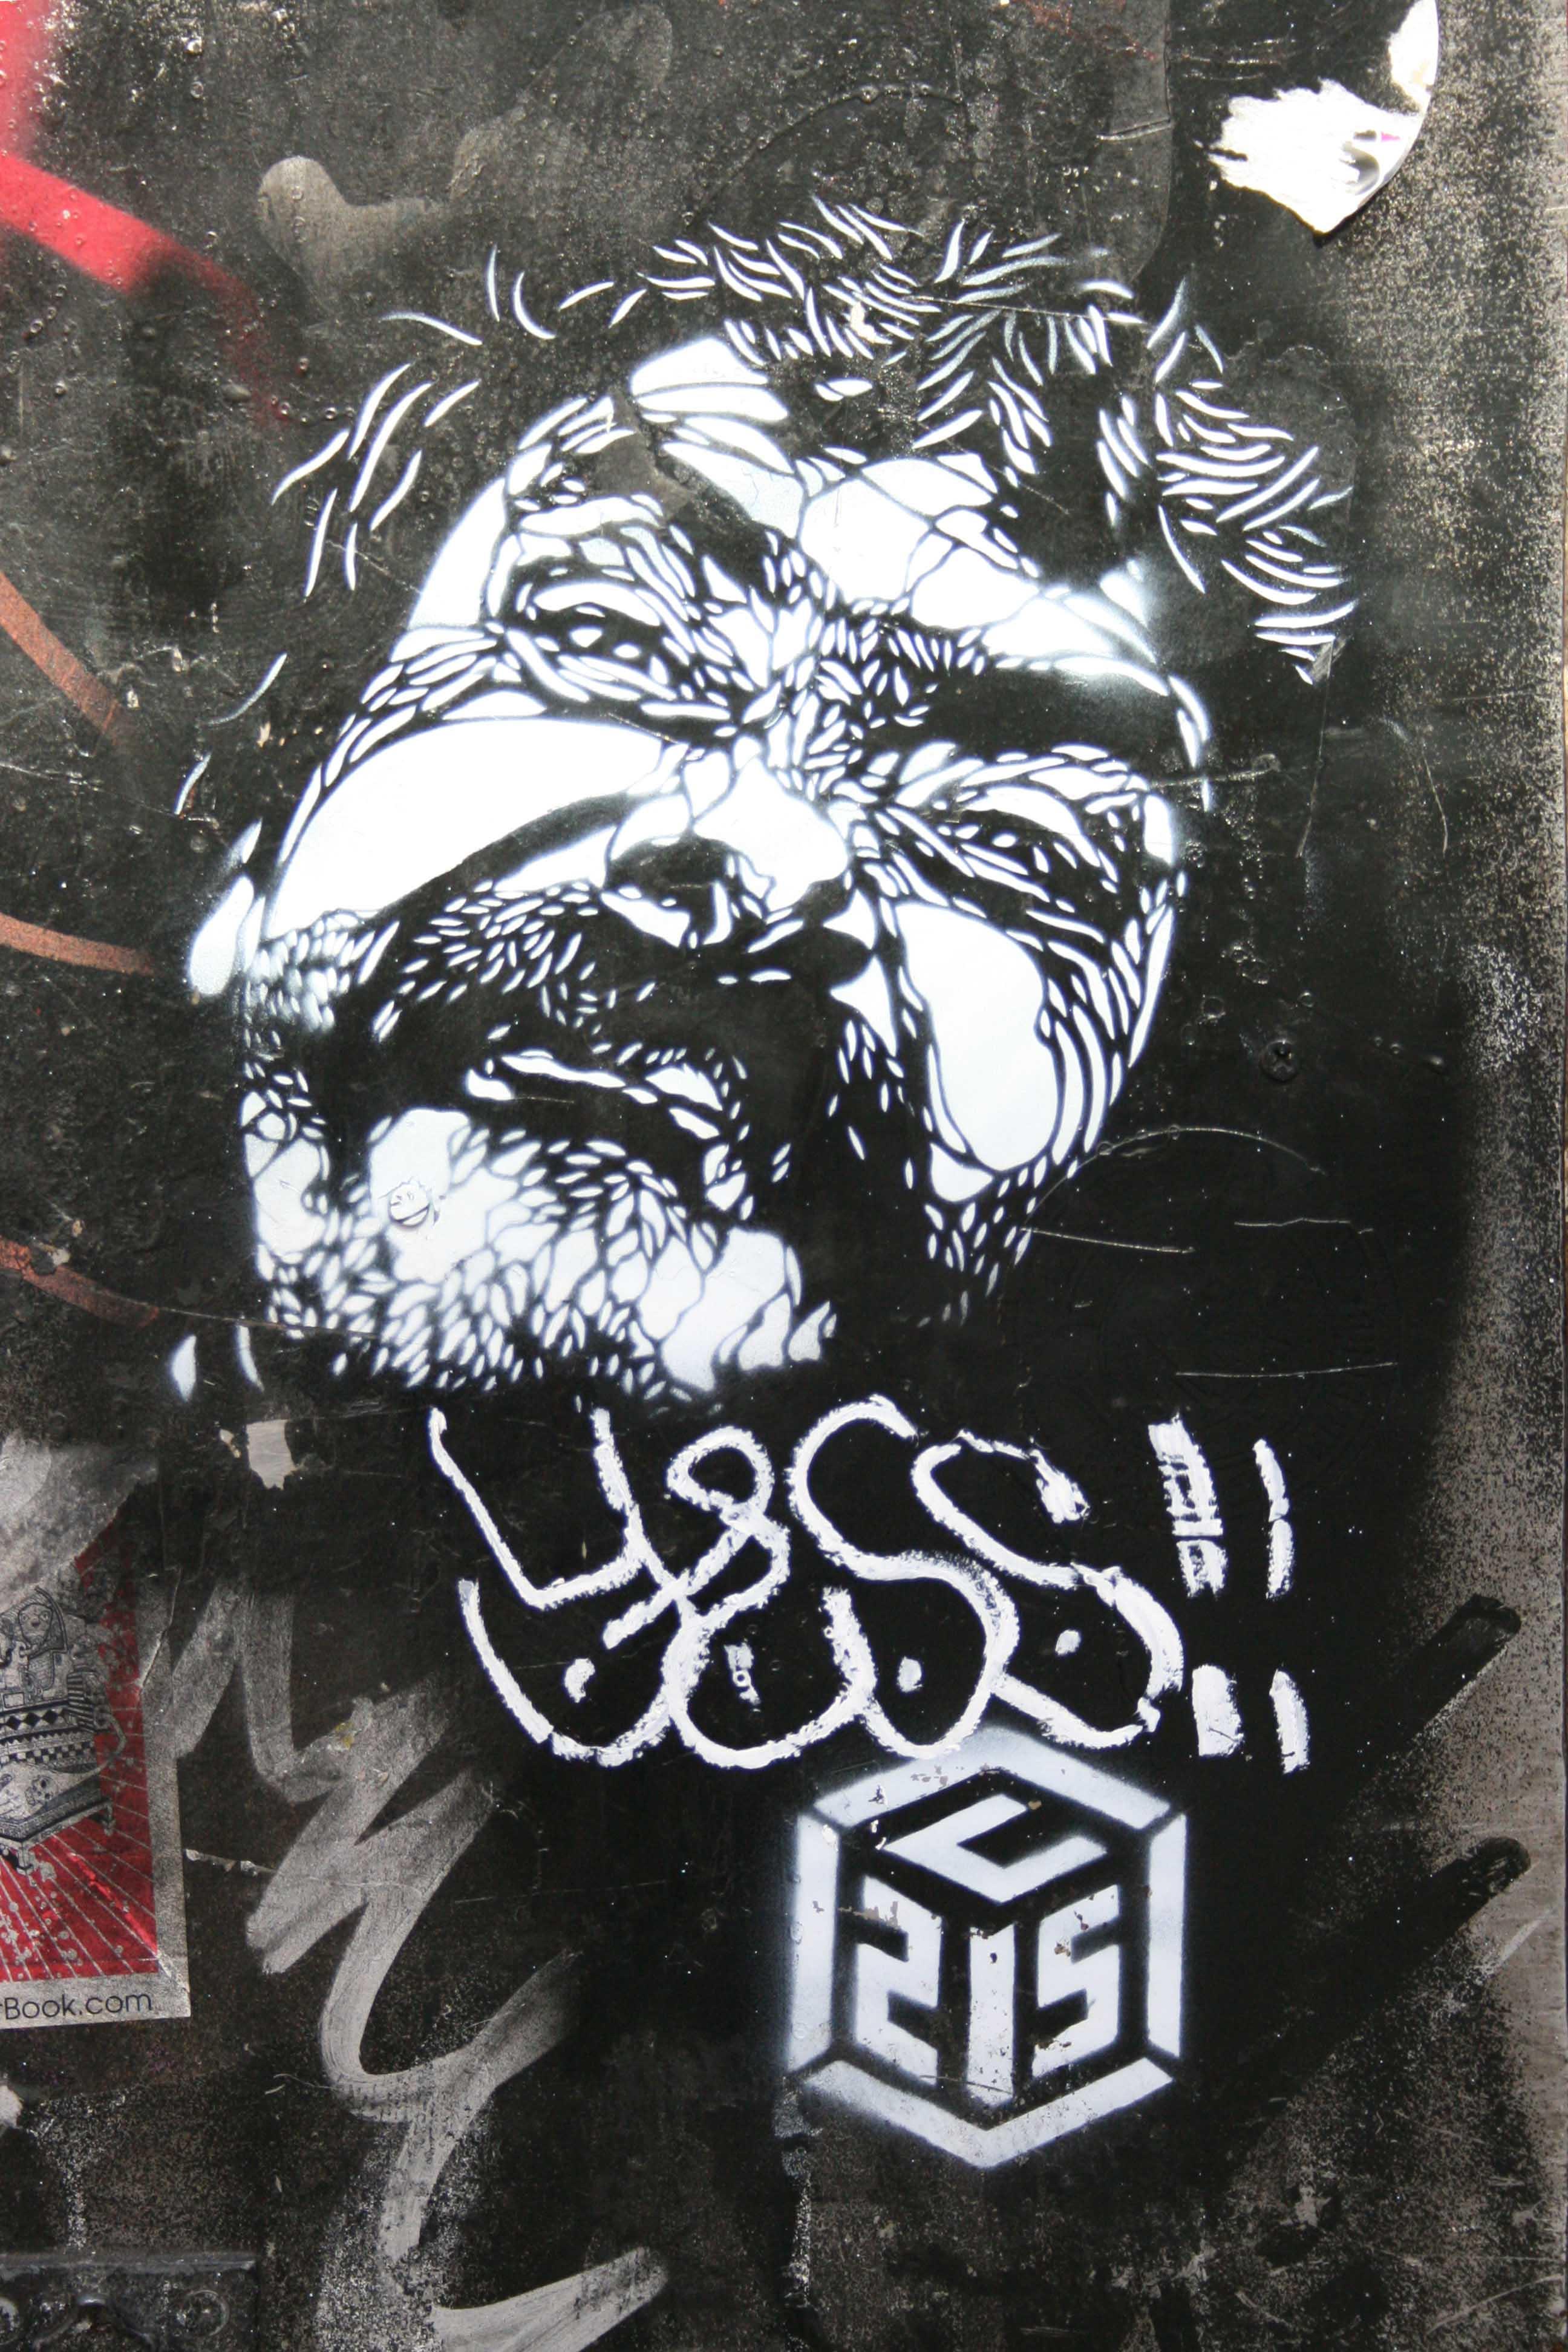 Upturned Face - Street Art by C215 in London